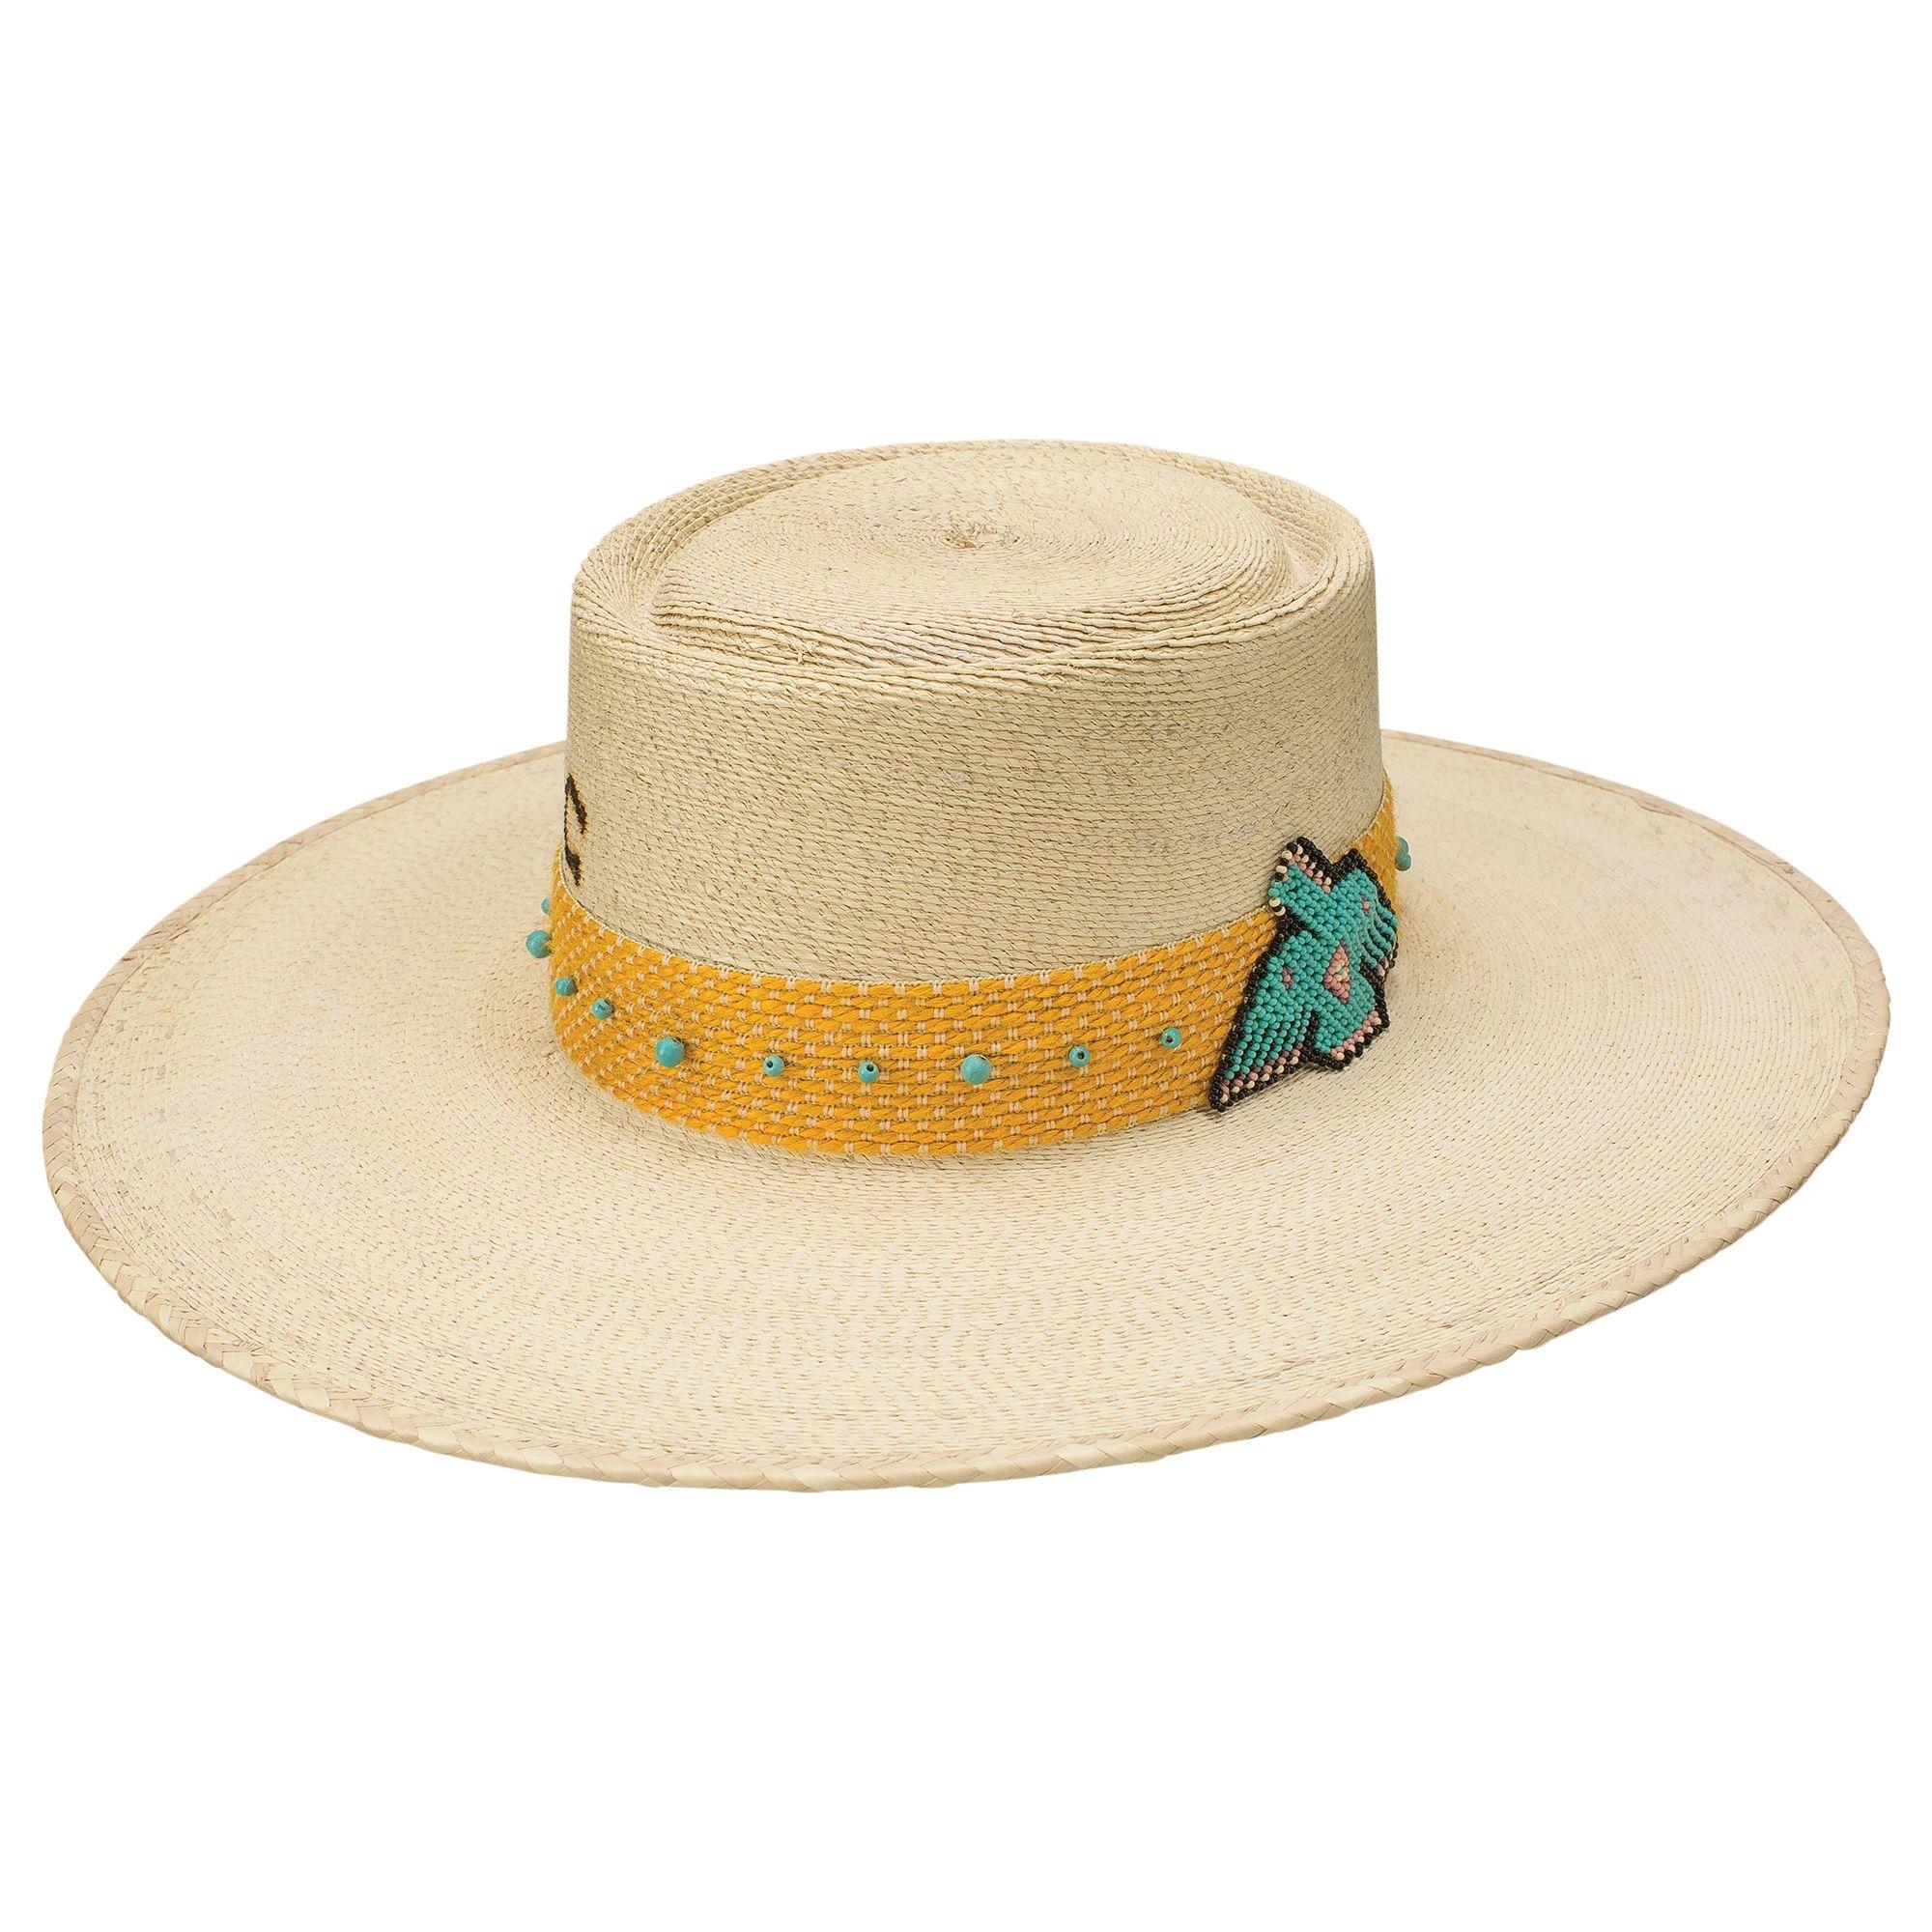 Charlie 1 Horse War Eagle - Straw Cowboy Hat